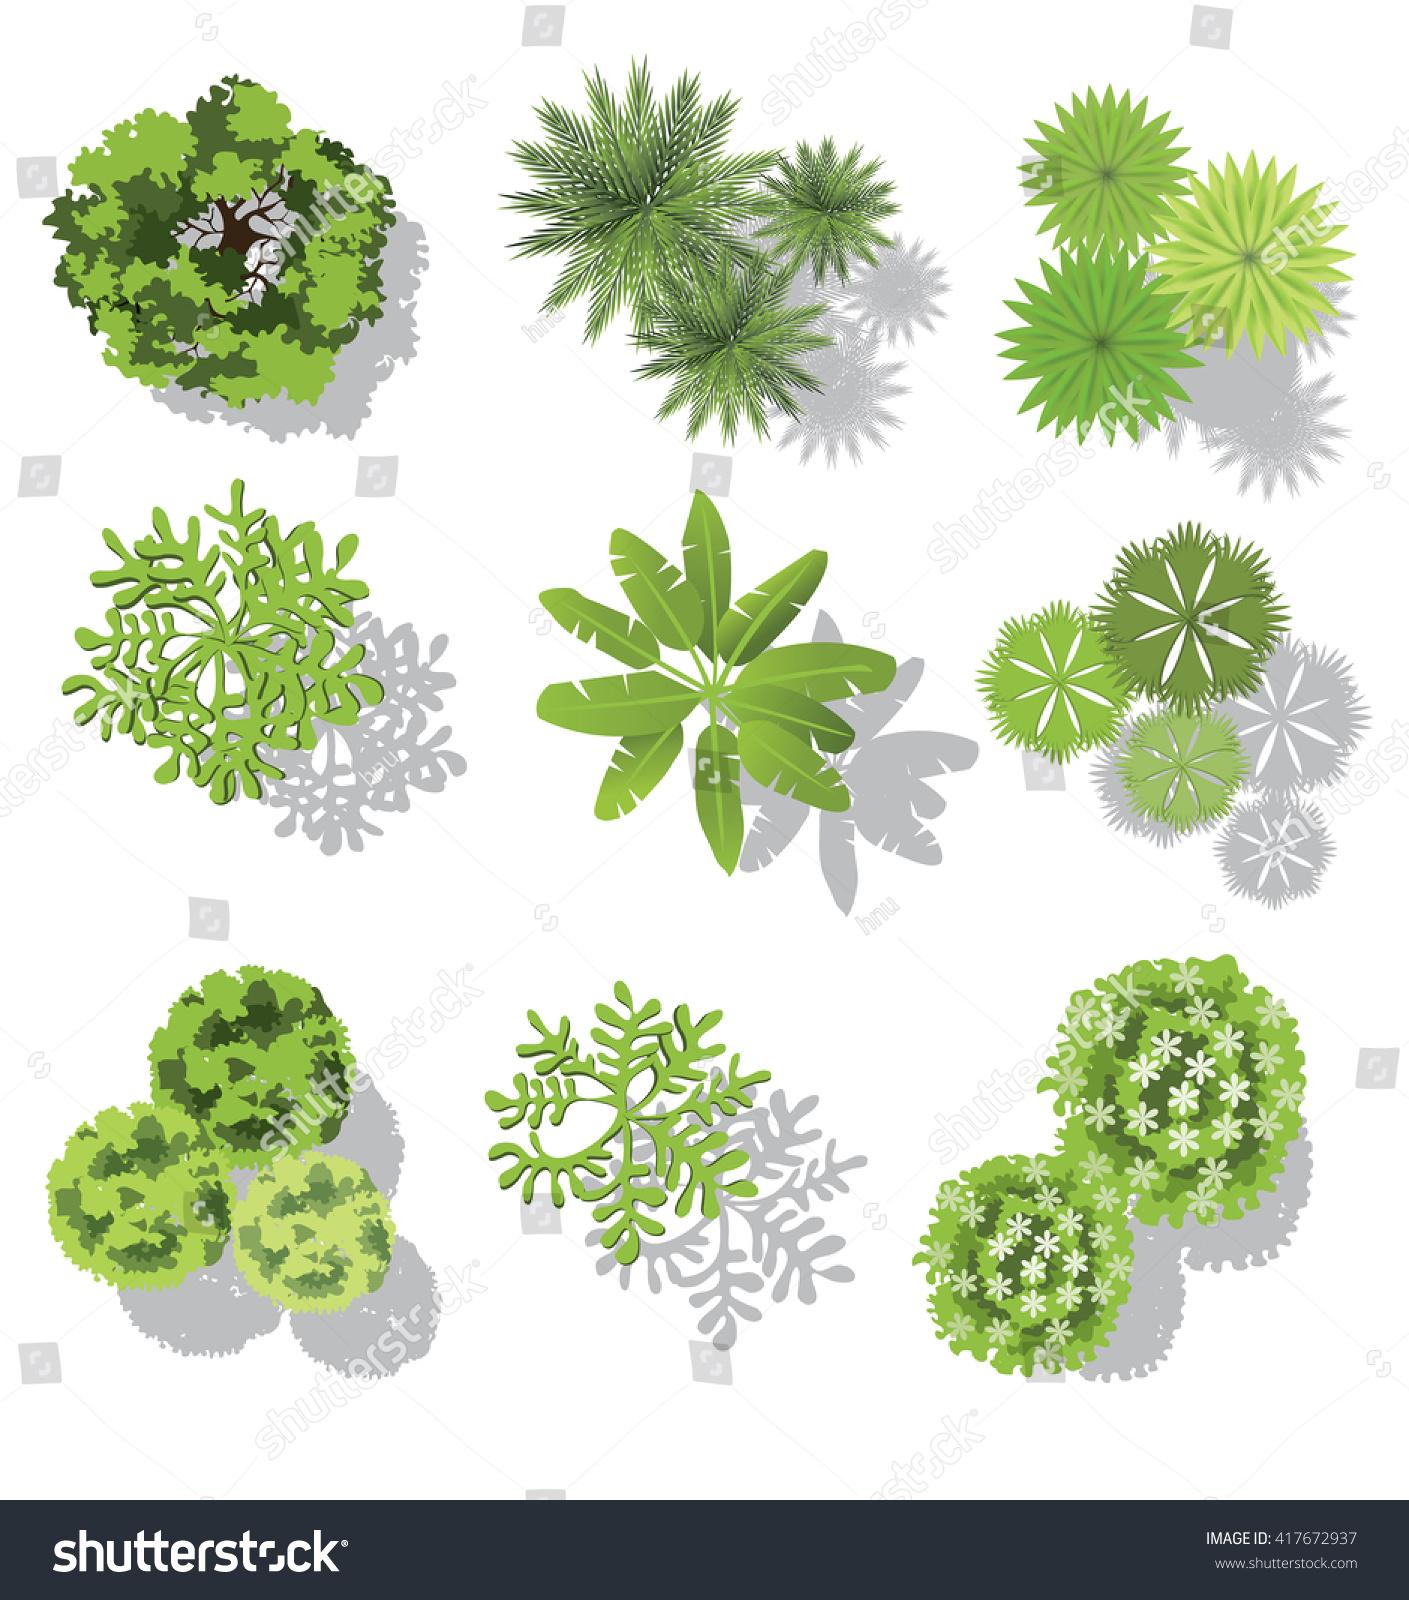 Set Treetop Symbols Architectural Landscape Design Stock Vector 417672937 - Shutterstock